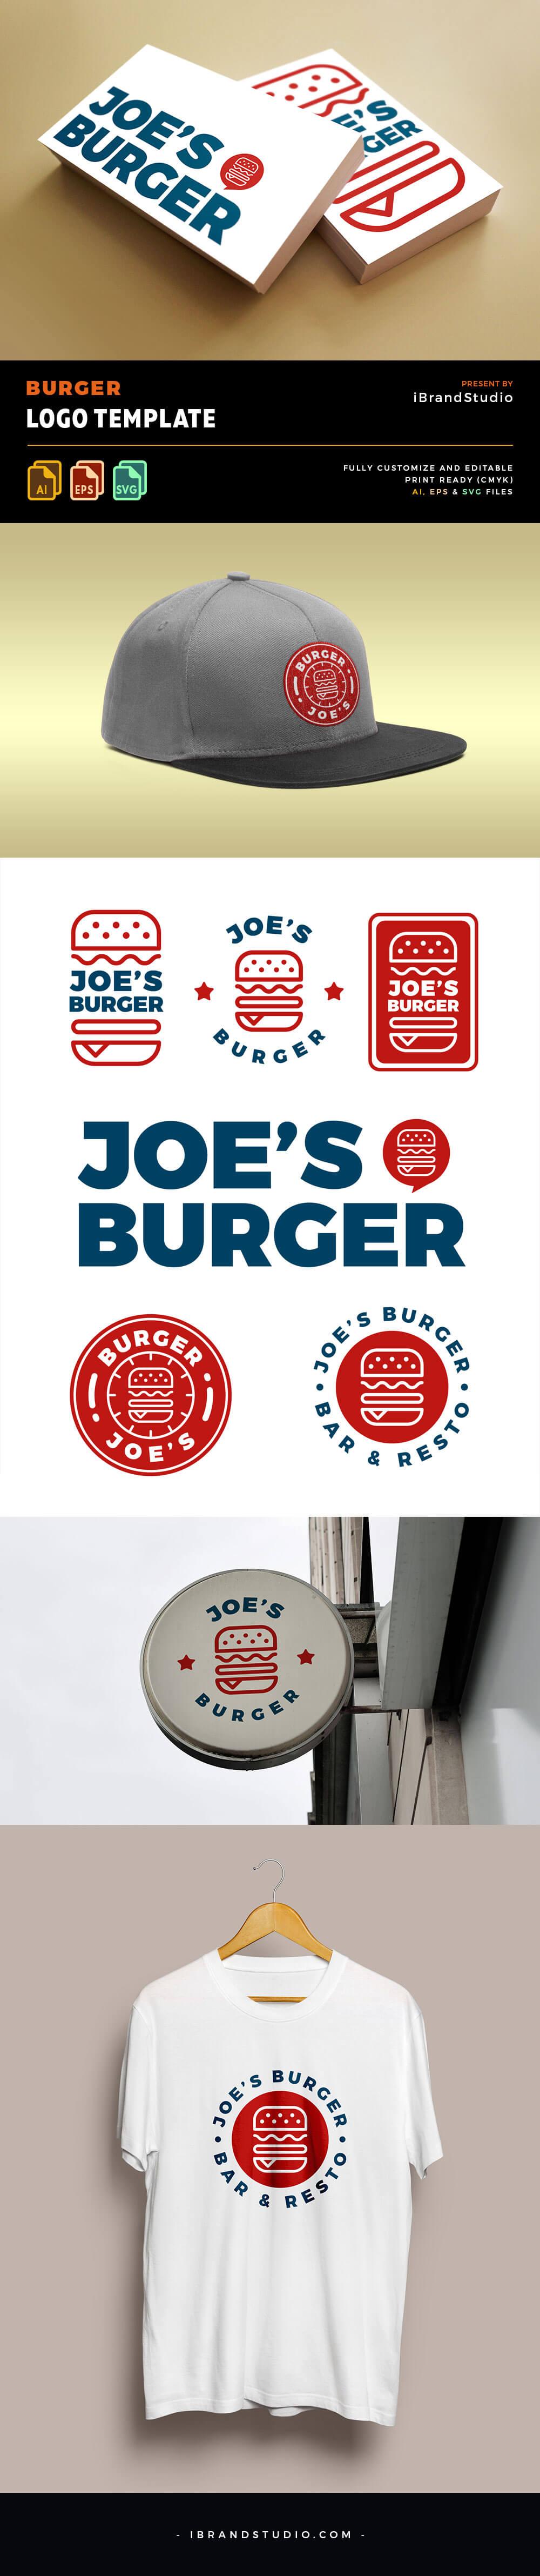 Free Burger Logo Templates